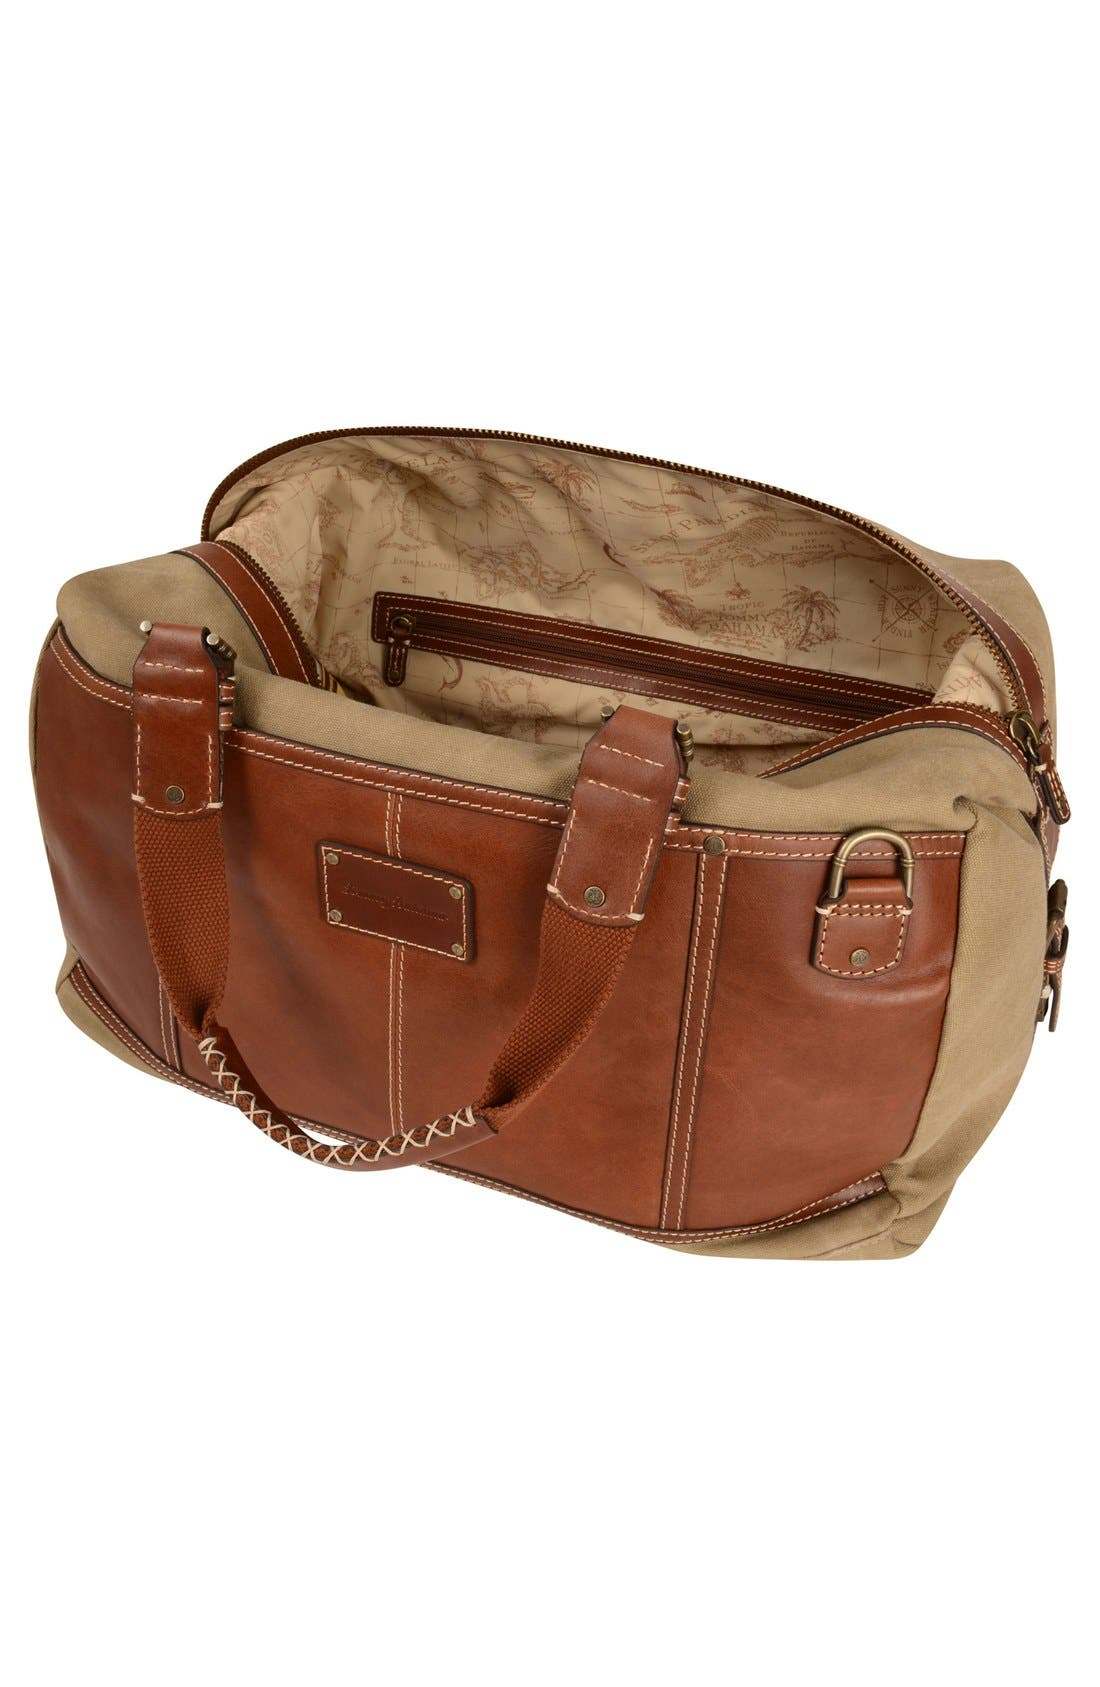 Canvas & Leather Duffel Bag,                             Alternate thumbnail 3, color,                             210